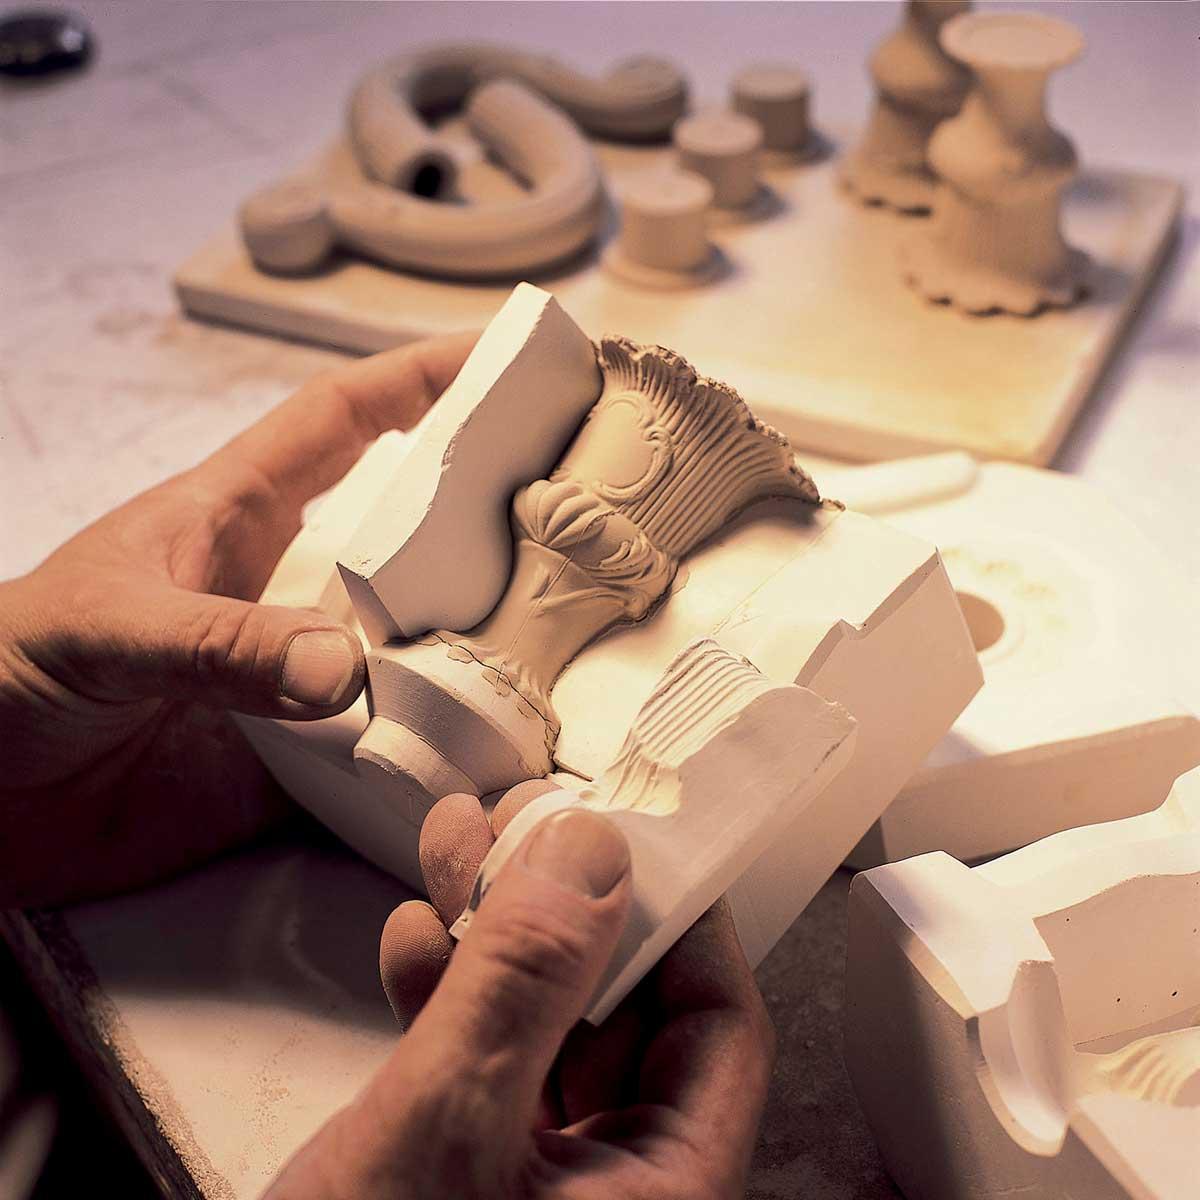 Porzellanmanufaktur Ludwigsburg: Formen; Foto: Porzellanmanufaktur Ludwigsburg GmbH